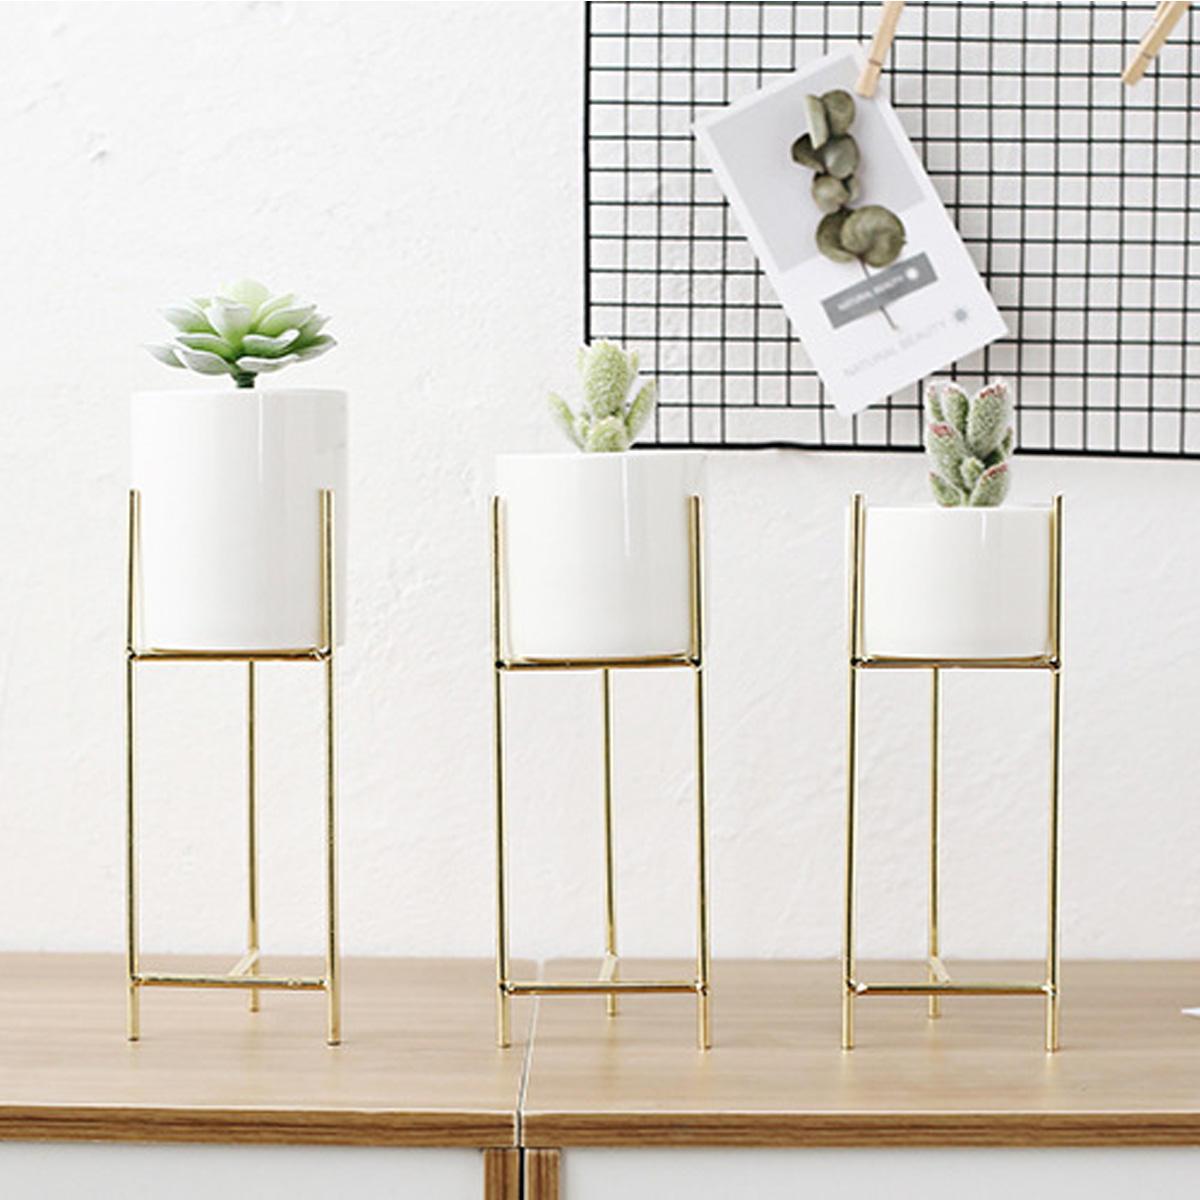 Keramik Pot Bunga Logam Rak Taman Plant Succulent Planter Stand Holder Dekorasi Hardware Dekoratif